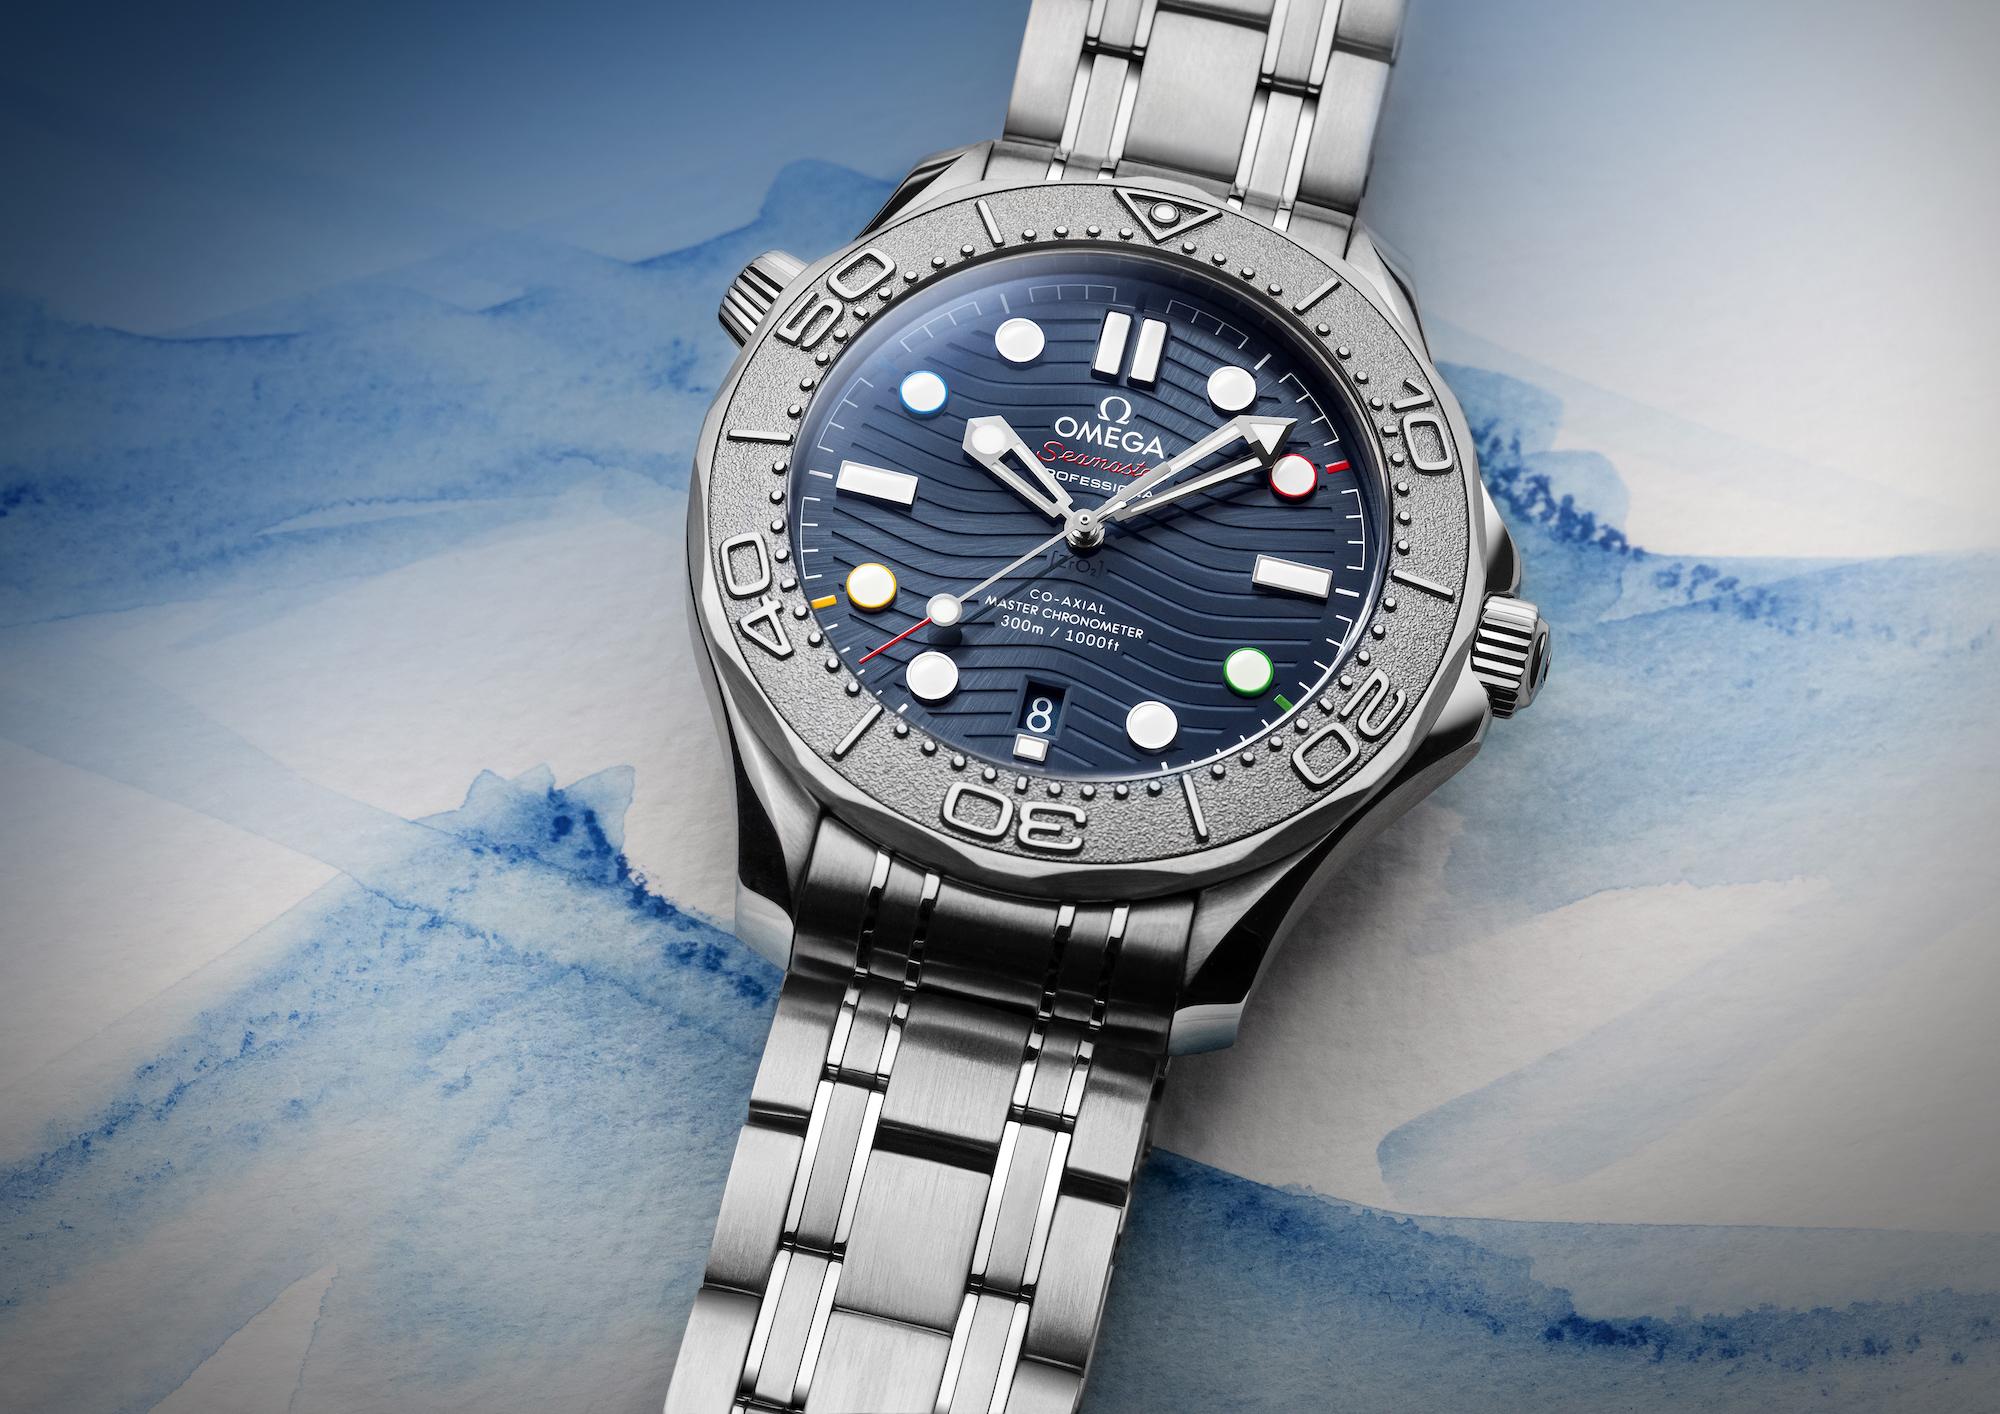 Omega Seamaster Diver 300M Beijing 2022 522.30.42.20.03.001 lifestyle detalle